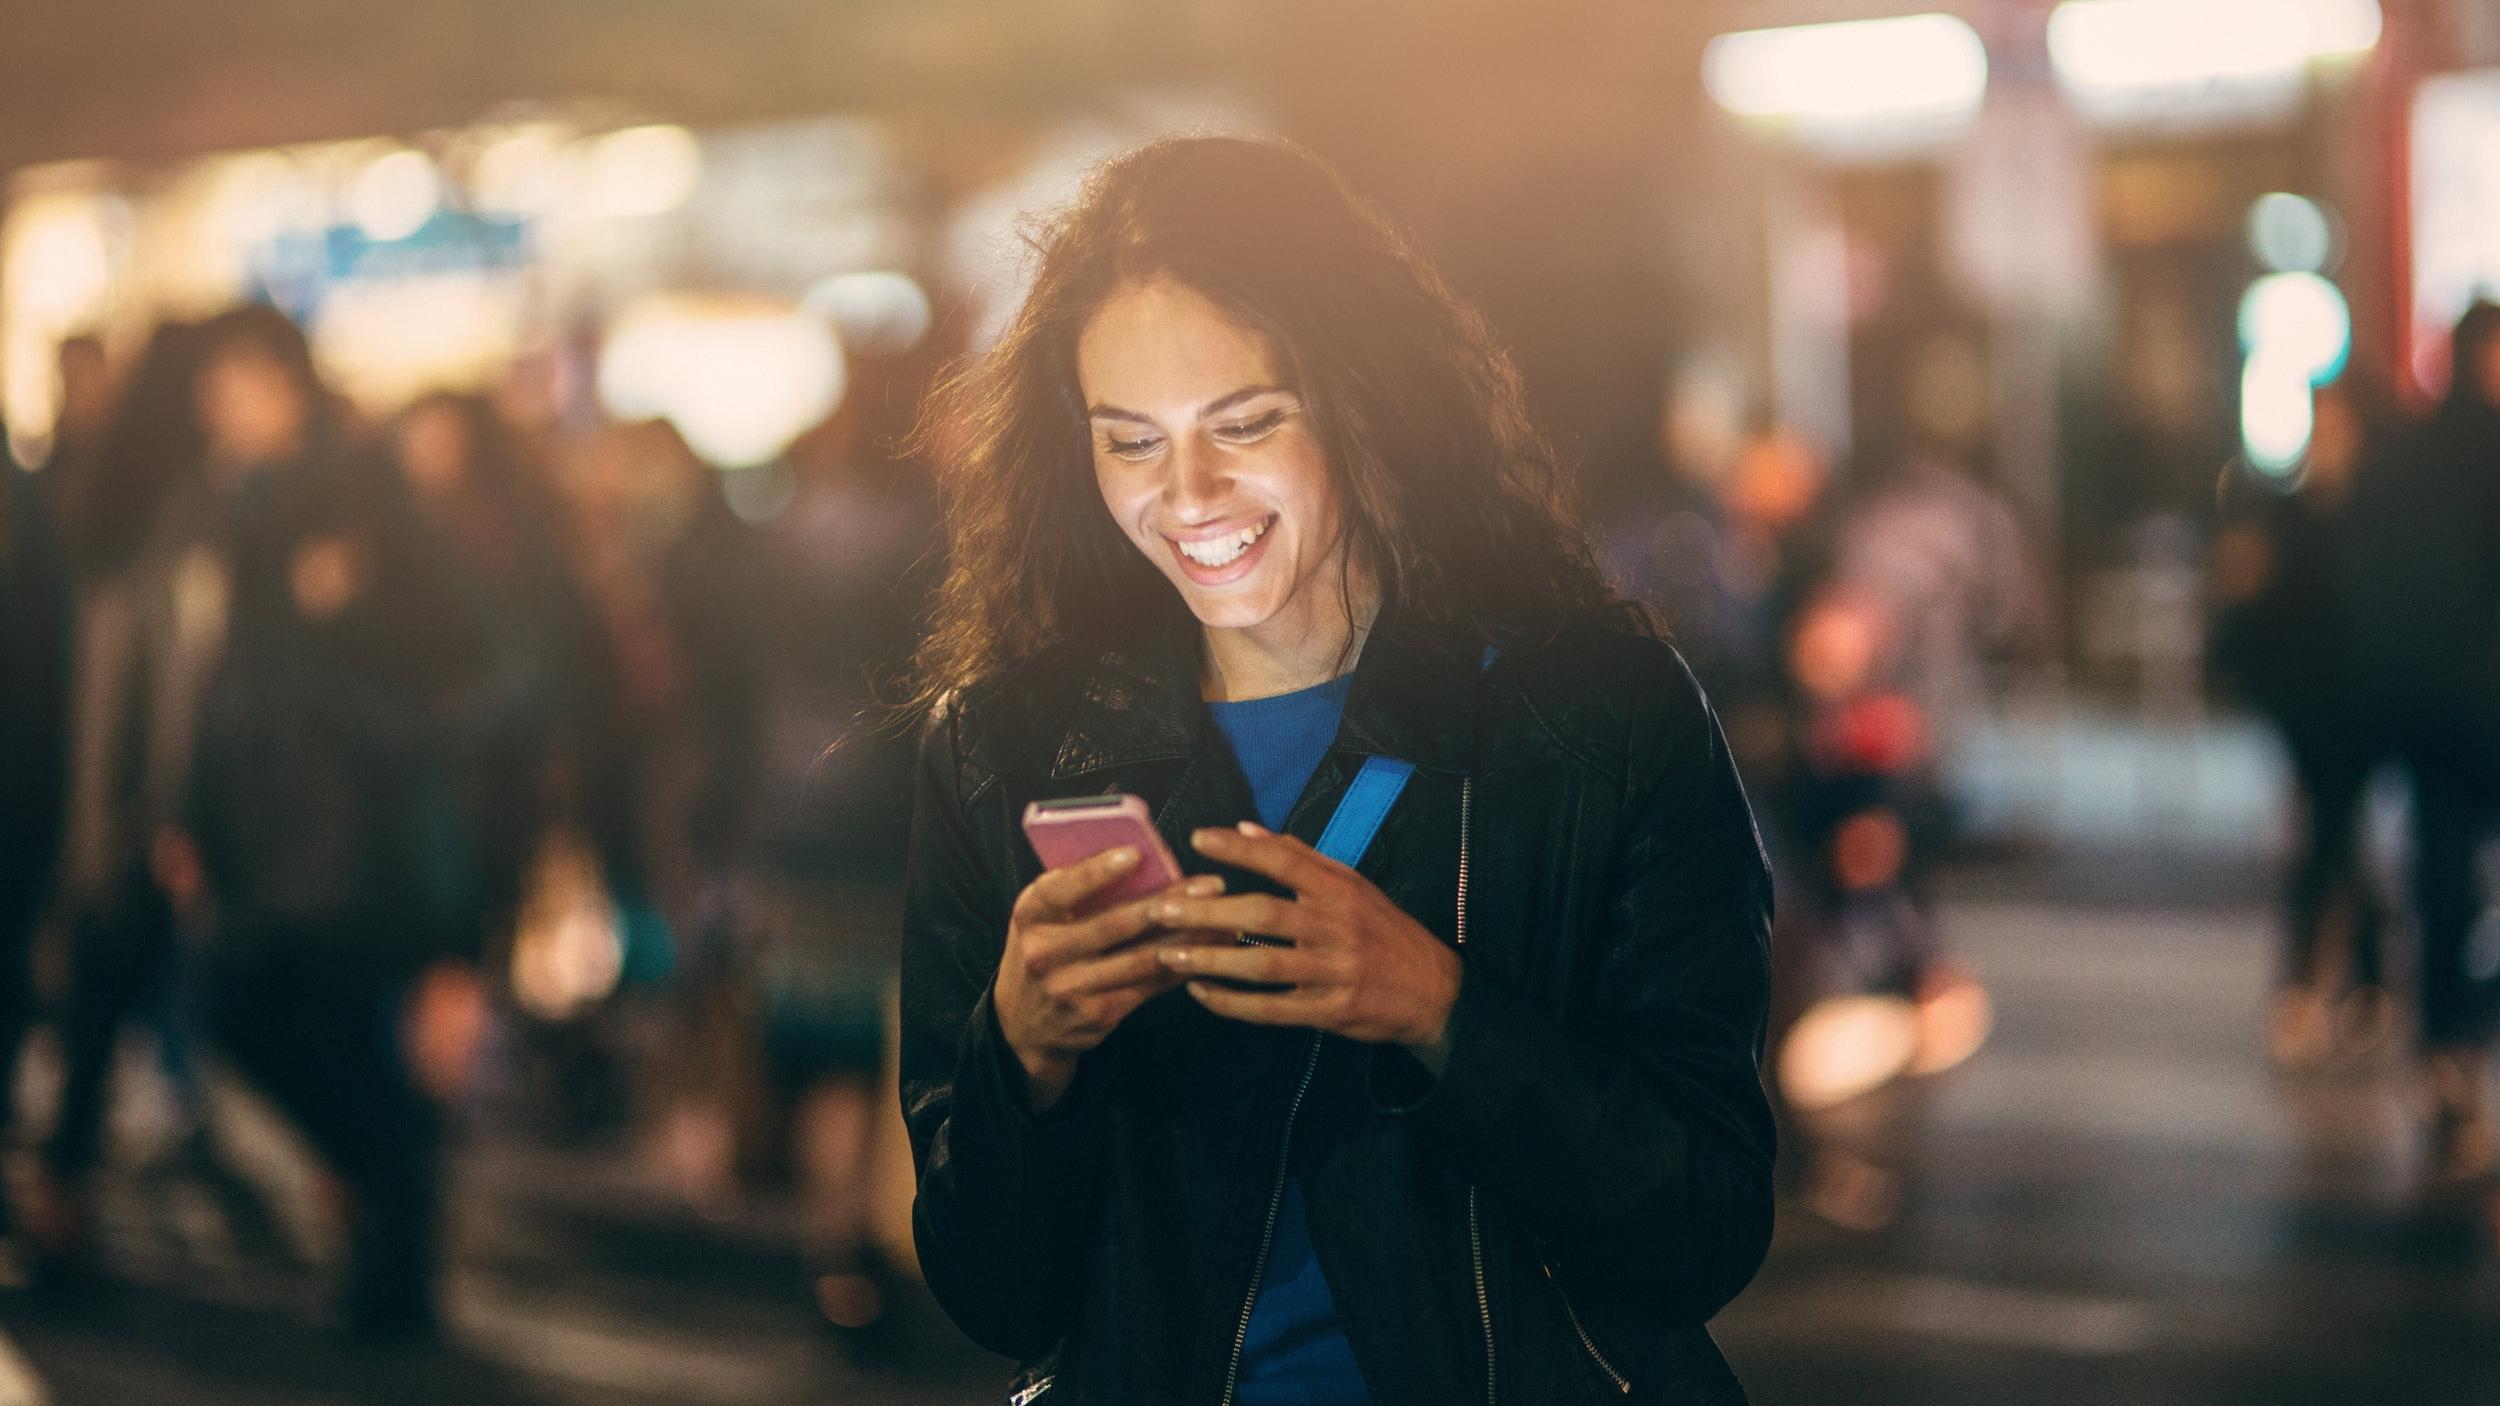 Texting-outside-at-night-505570578_5760x3345.jpeg